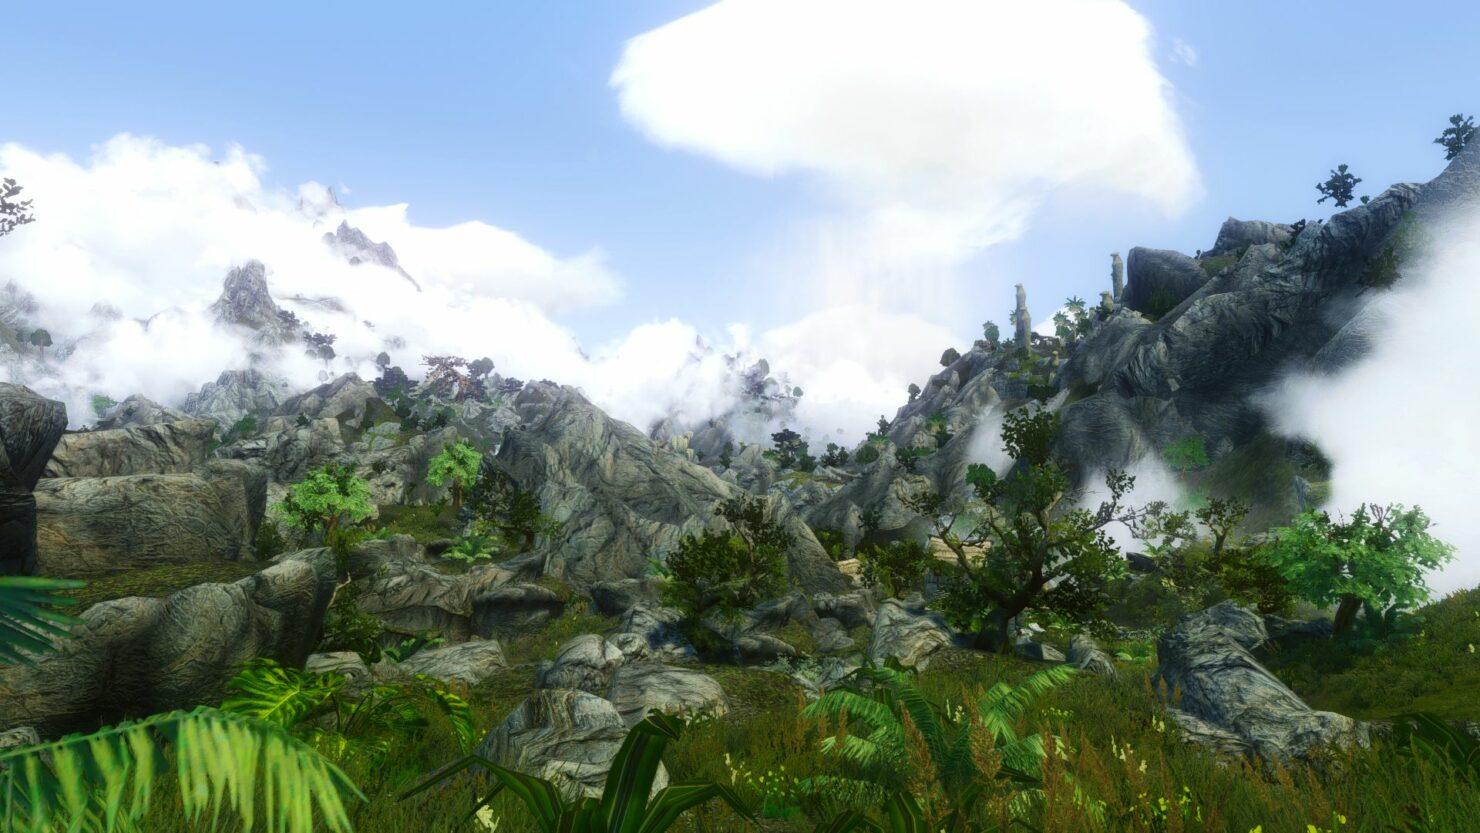 elder-scrolls-v-skyrim-legendary-edition-project-rainforest-mod-update-11